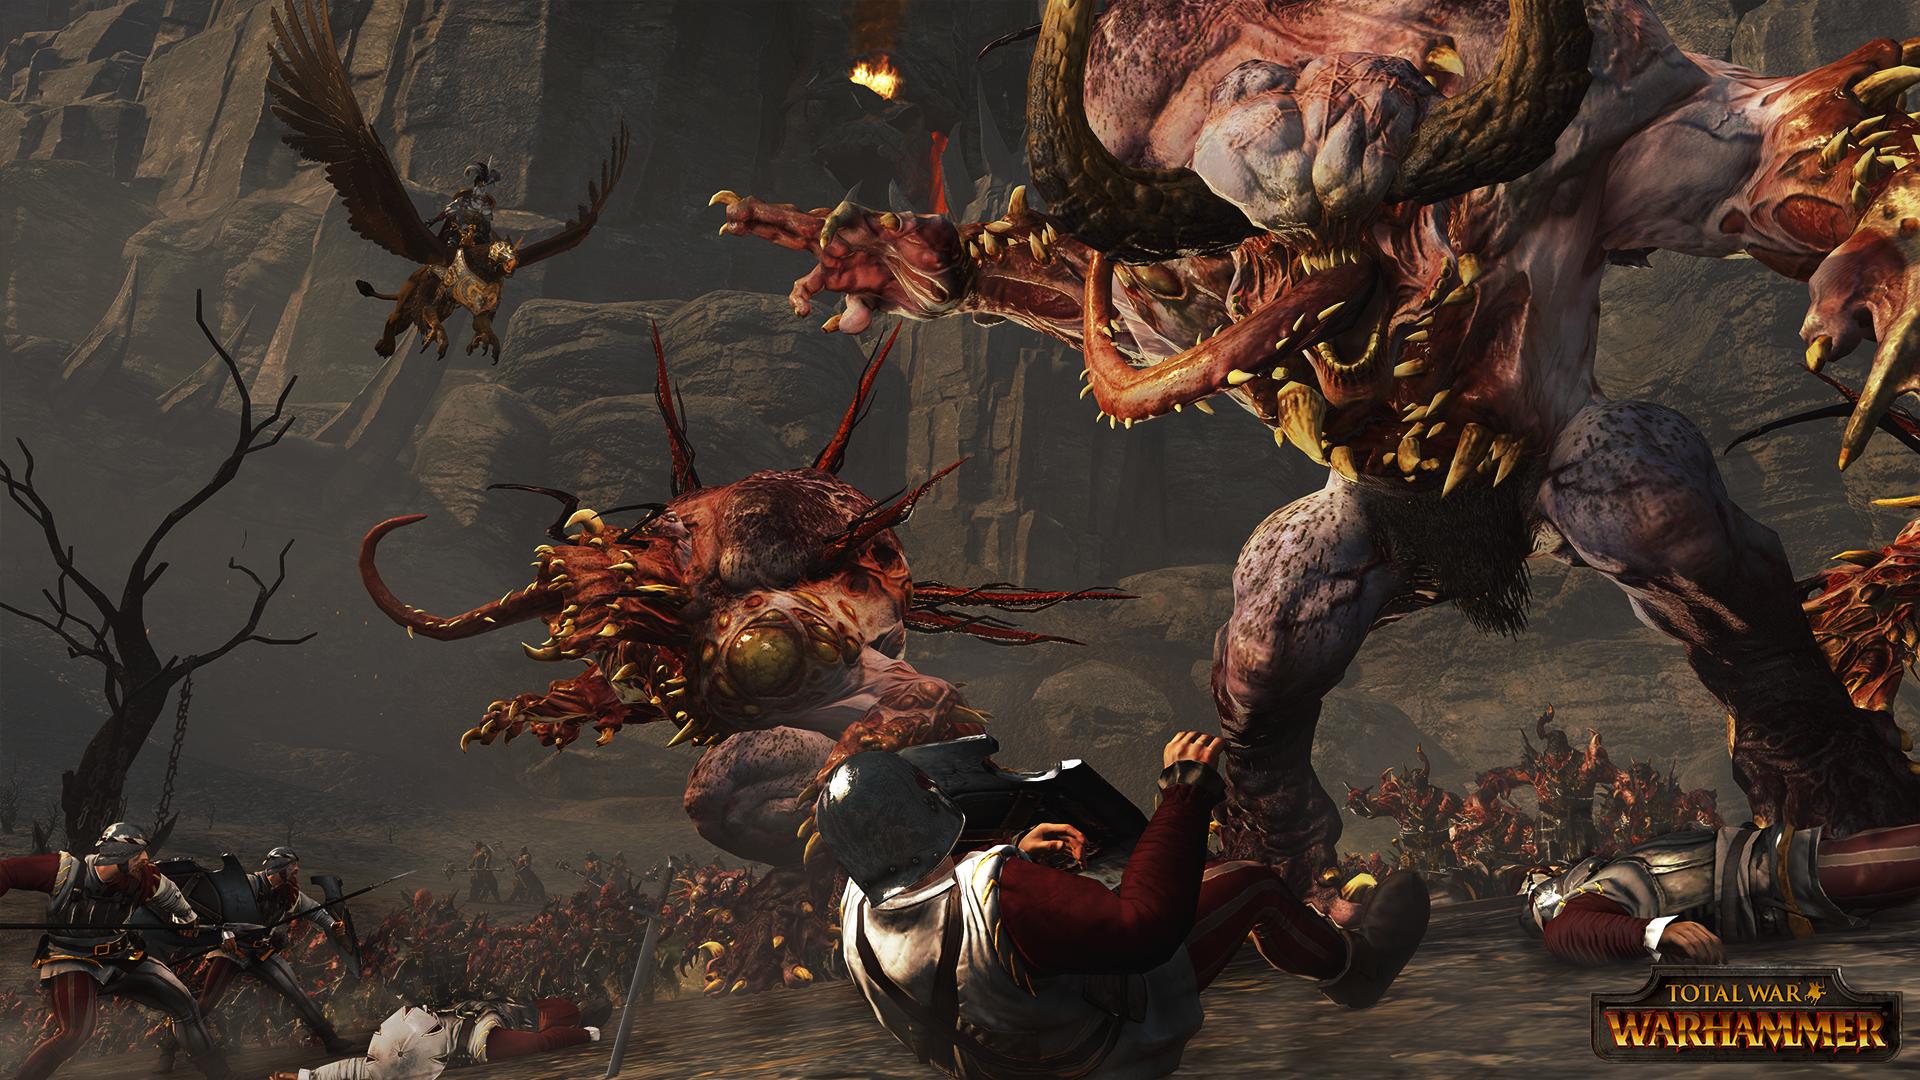 3064720-twwh_battle_chaos_spawn_1462975799.png - Total War: Warhammer